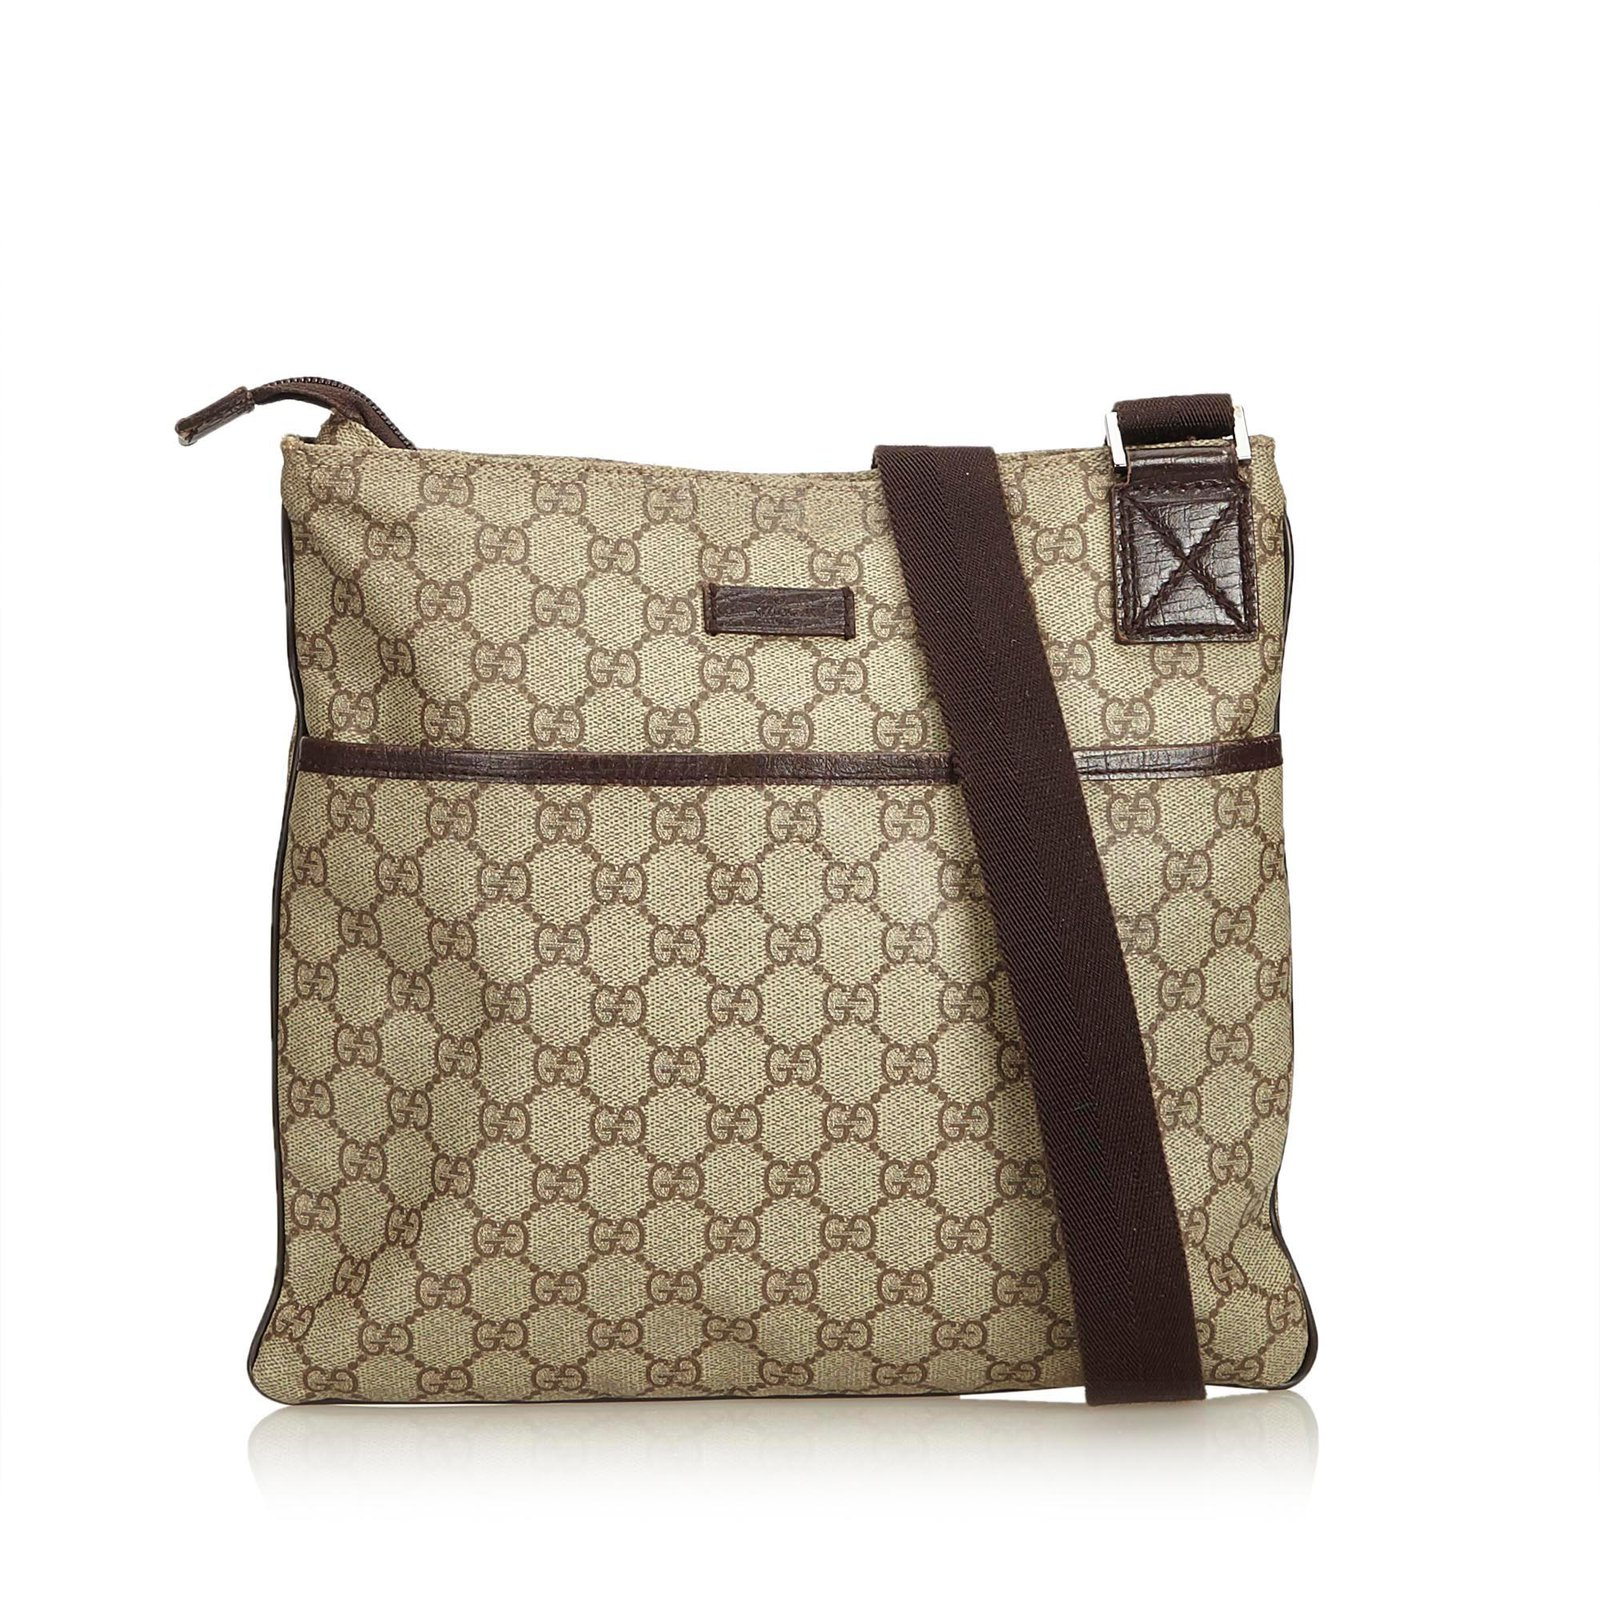 665fc5b82920 Gucci Guccissima Crossbody Bag Handbags Leather,Other,Plastic Brown,Beige  ref.90223